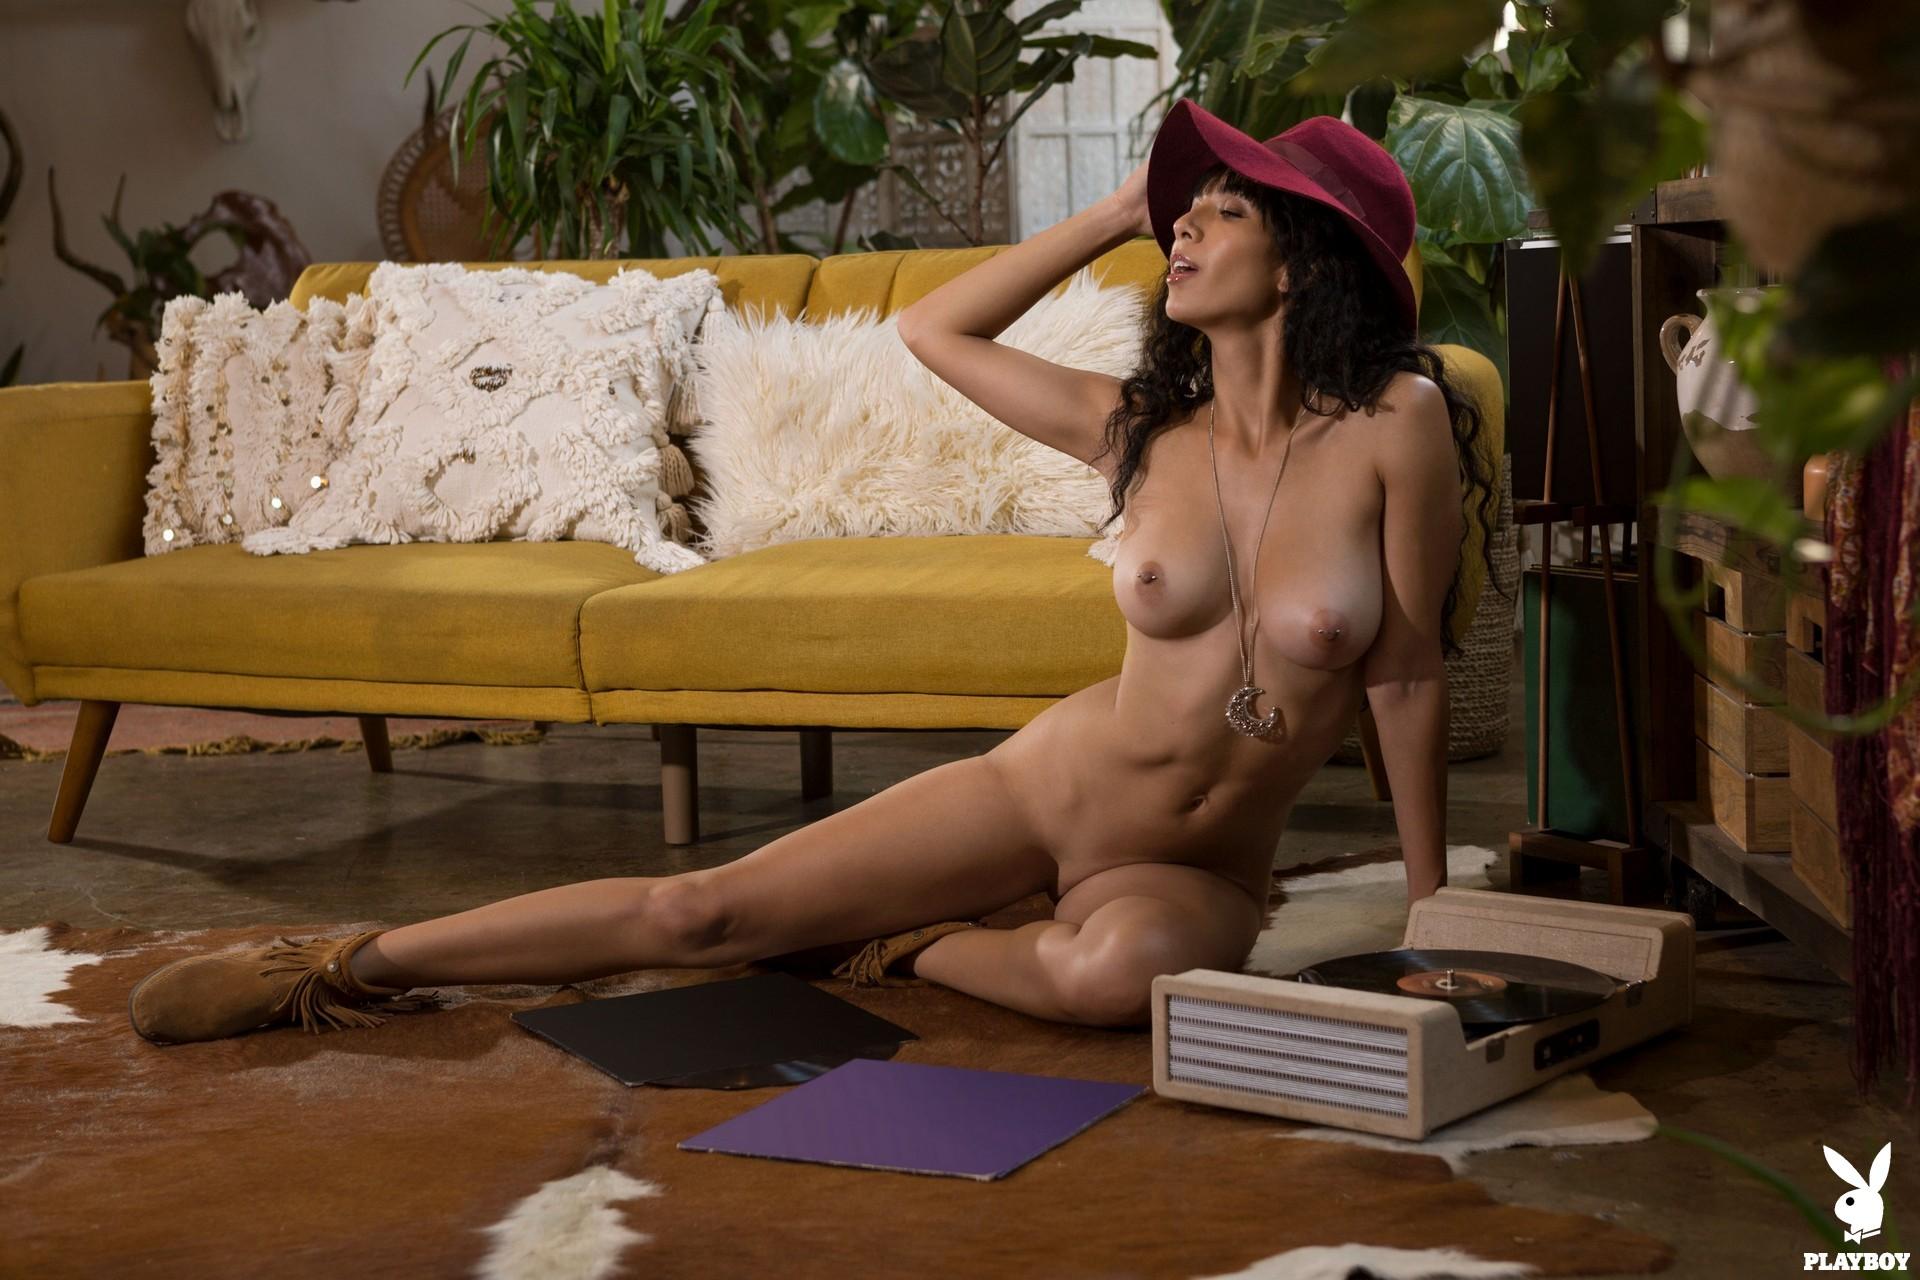 Erika De Leija in Funky and Free - Playboy Plus 7